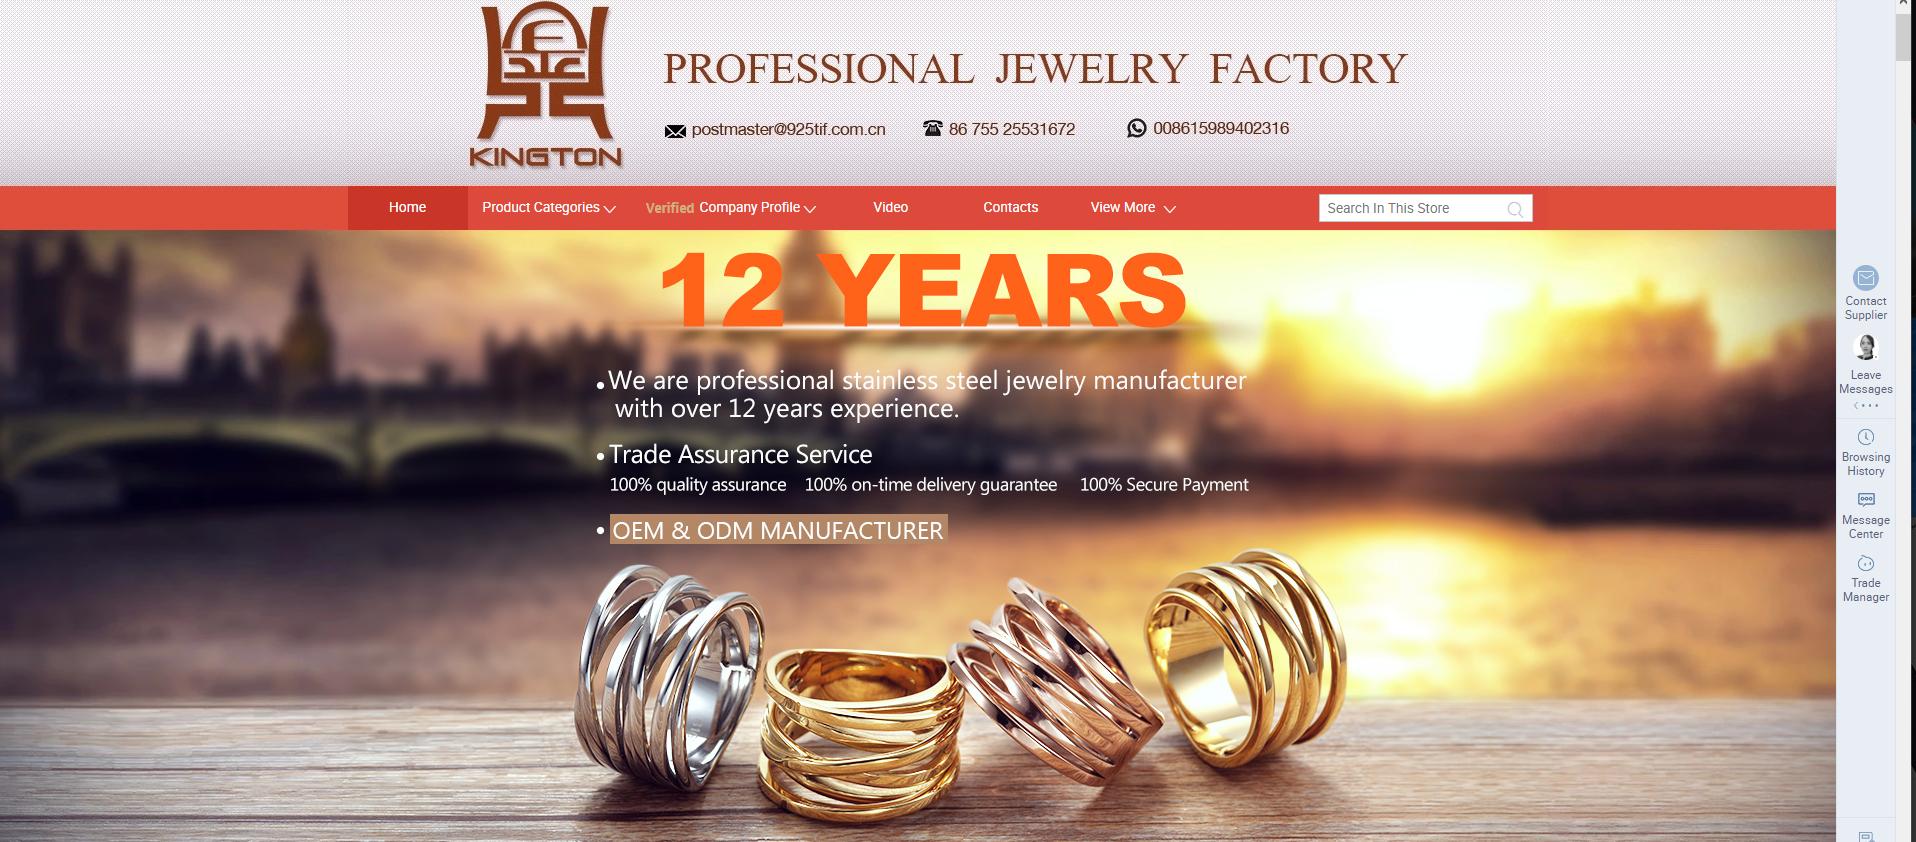 negocio de joyas con kington